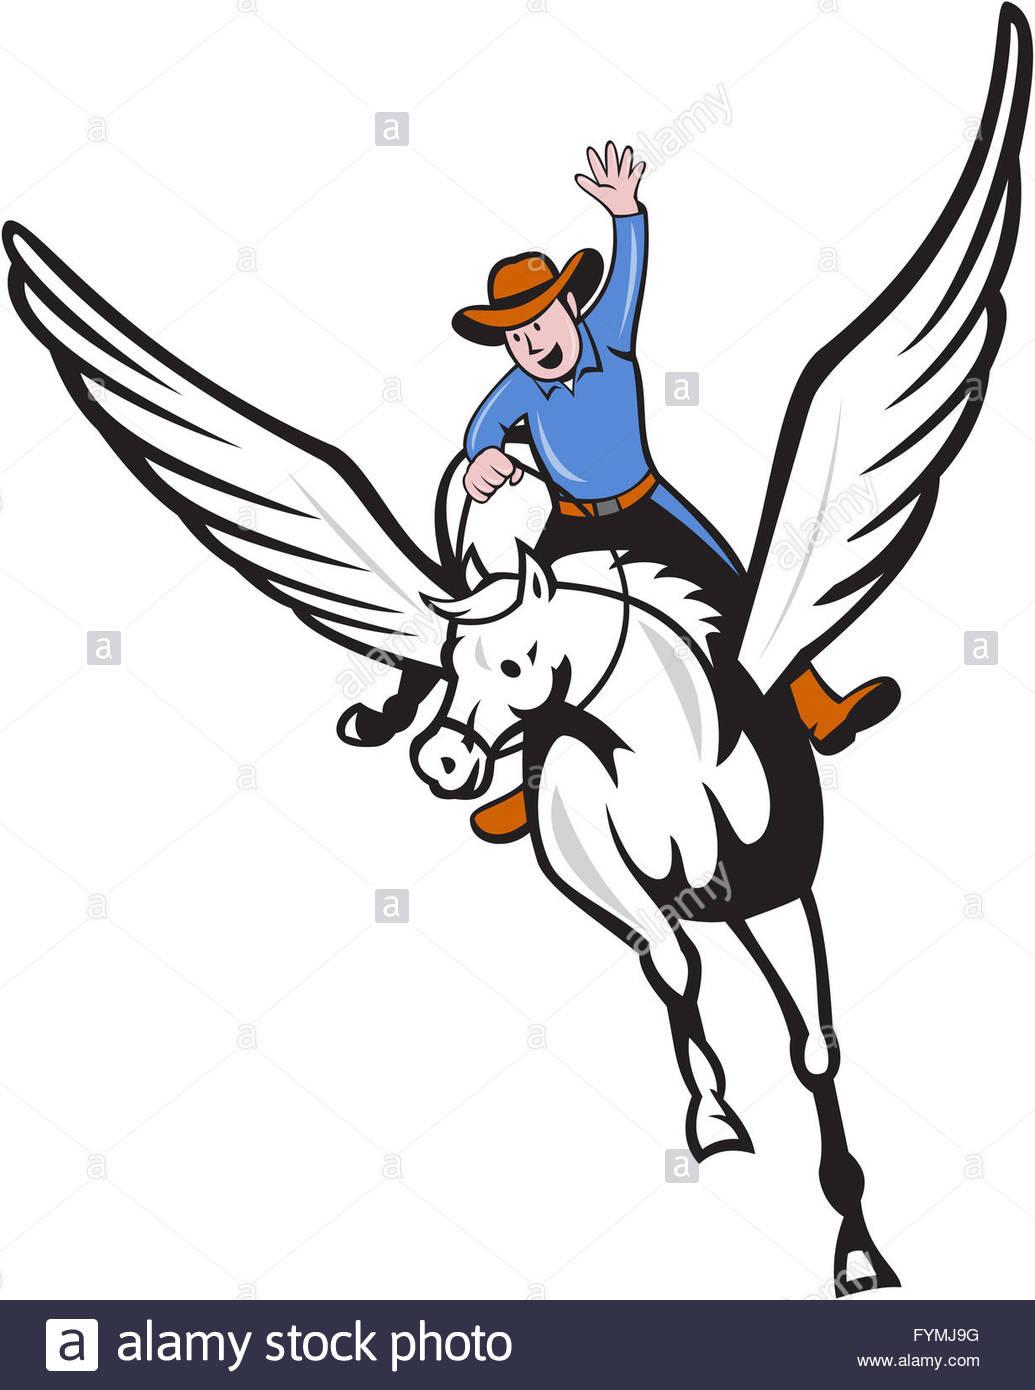 1035x1390 Cowboy Riding Pegasus Flying Horse Cartoon Stock Photo, Royalty